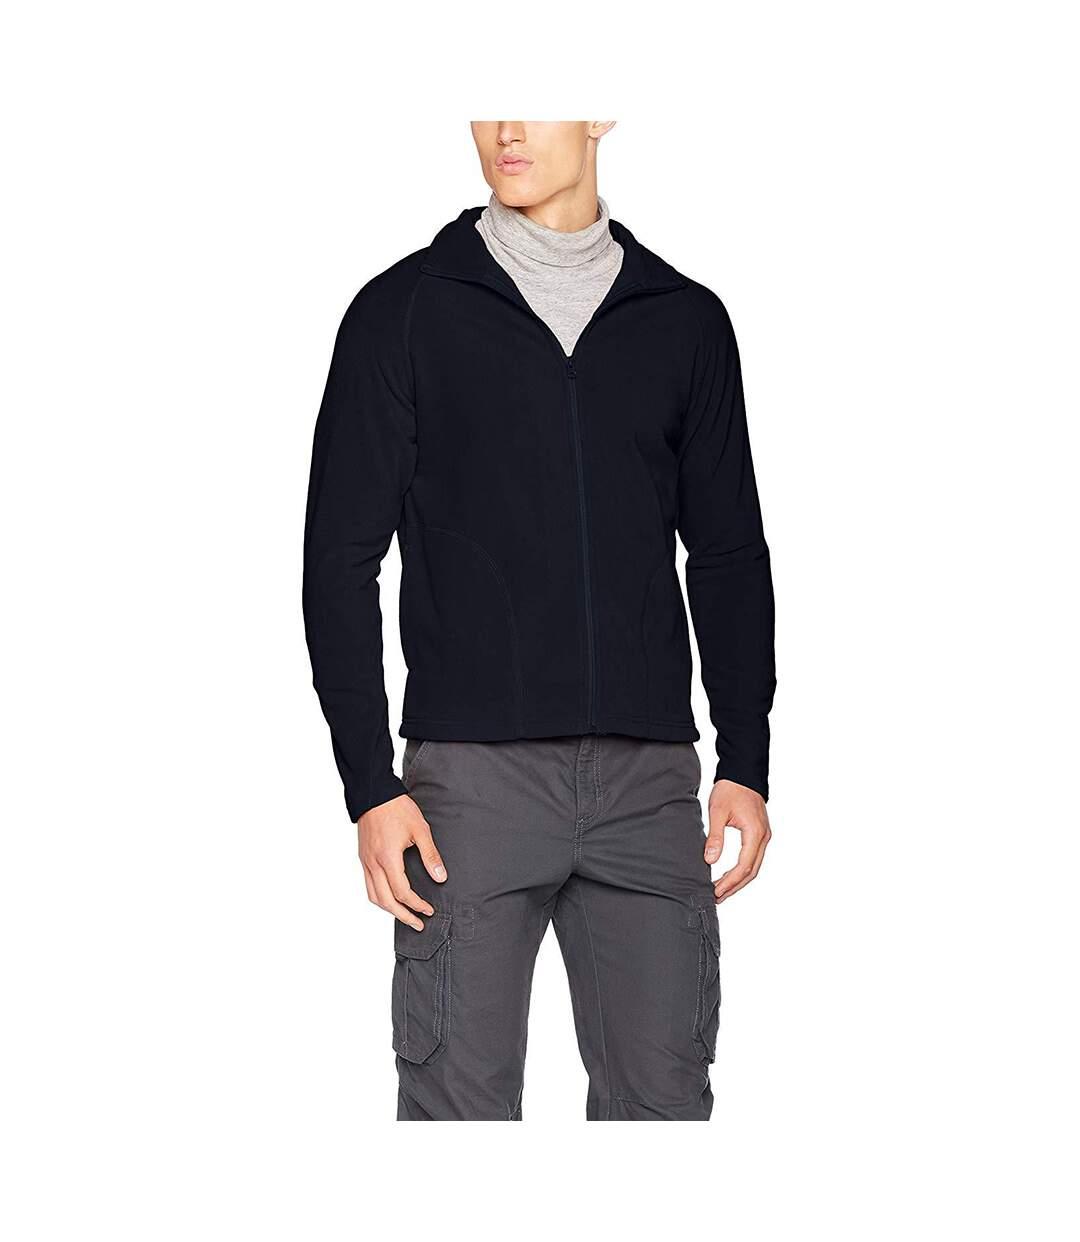 Result Core Mens Micron Anti Pill Fleece Jacket (Navy Blue) - UTBC852